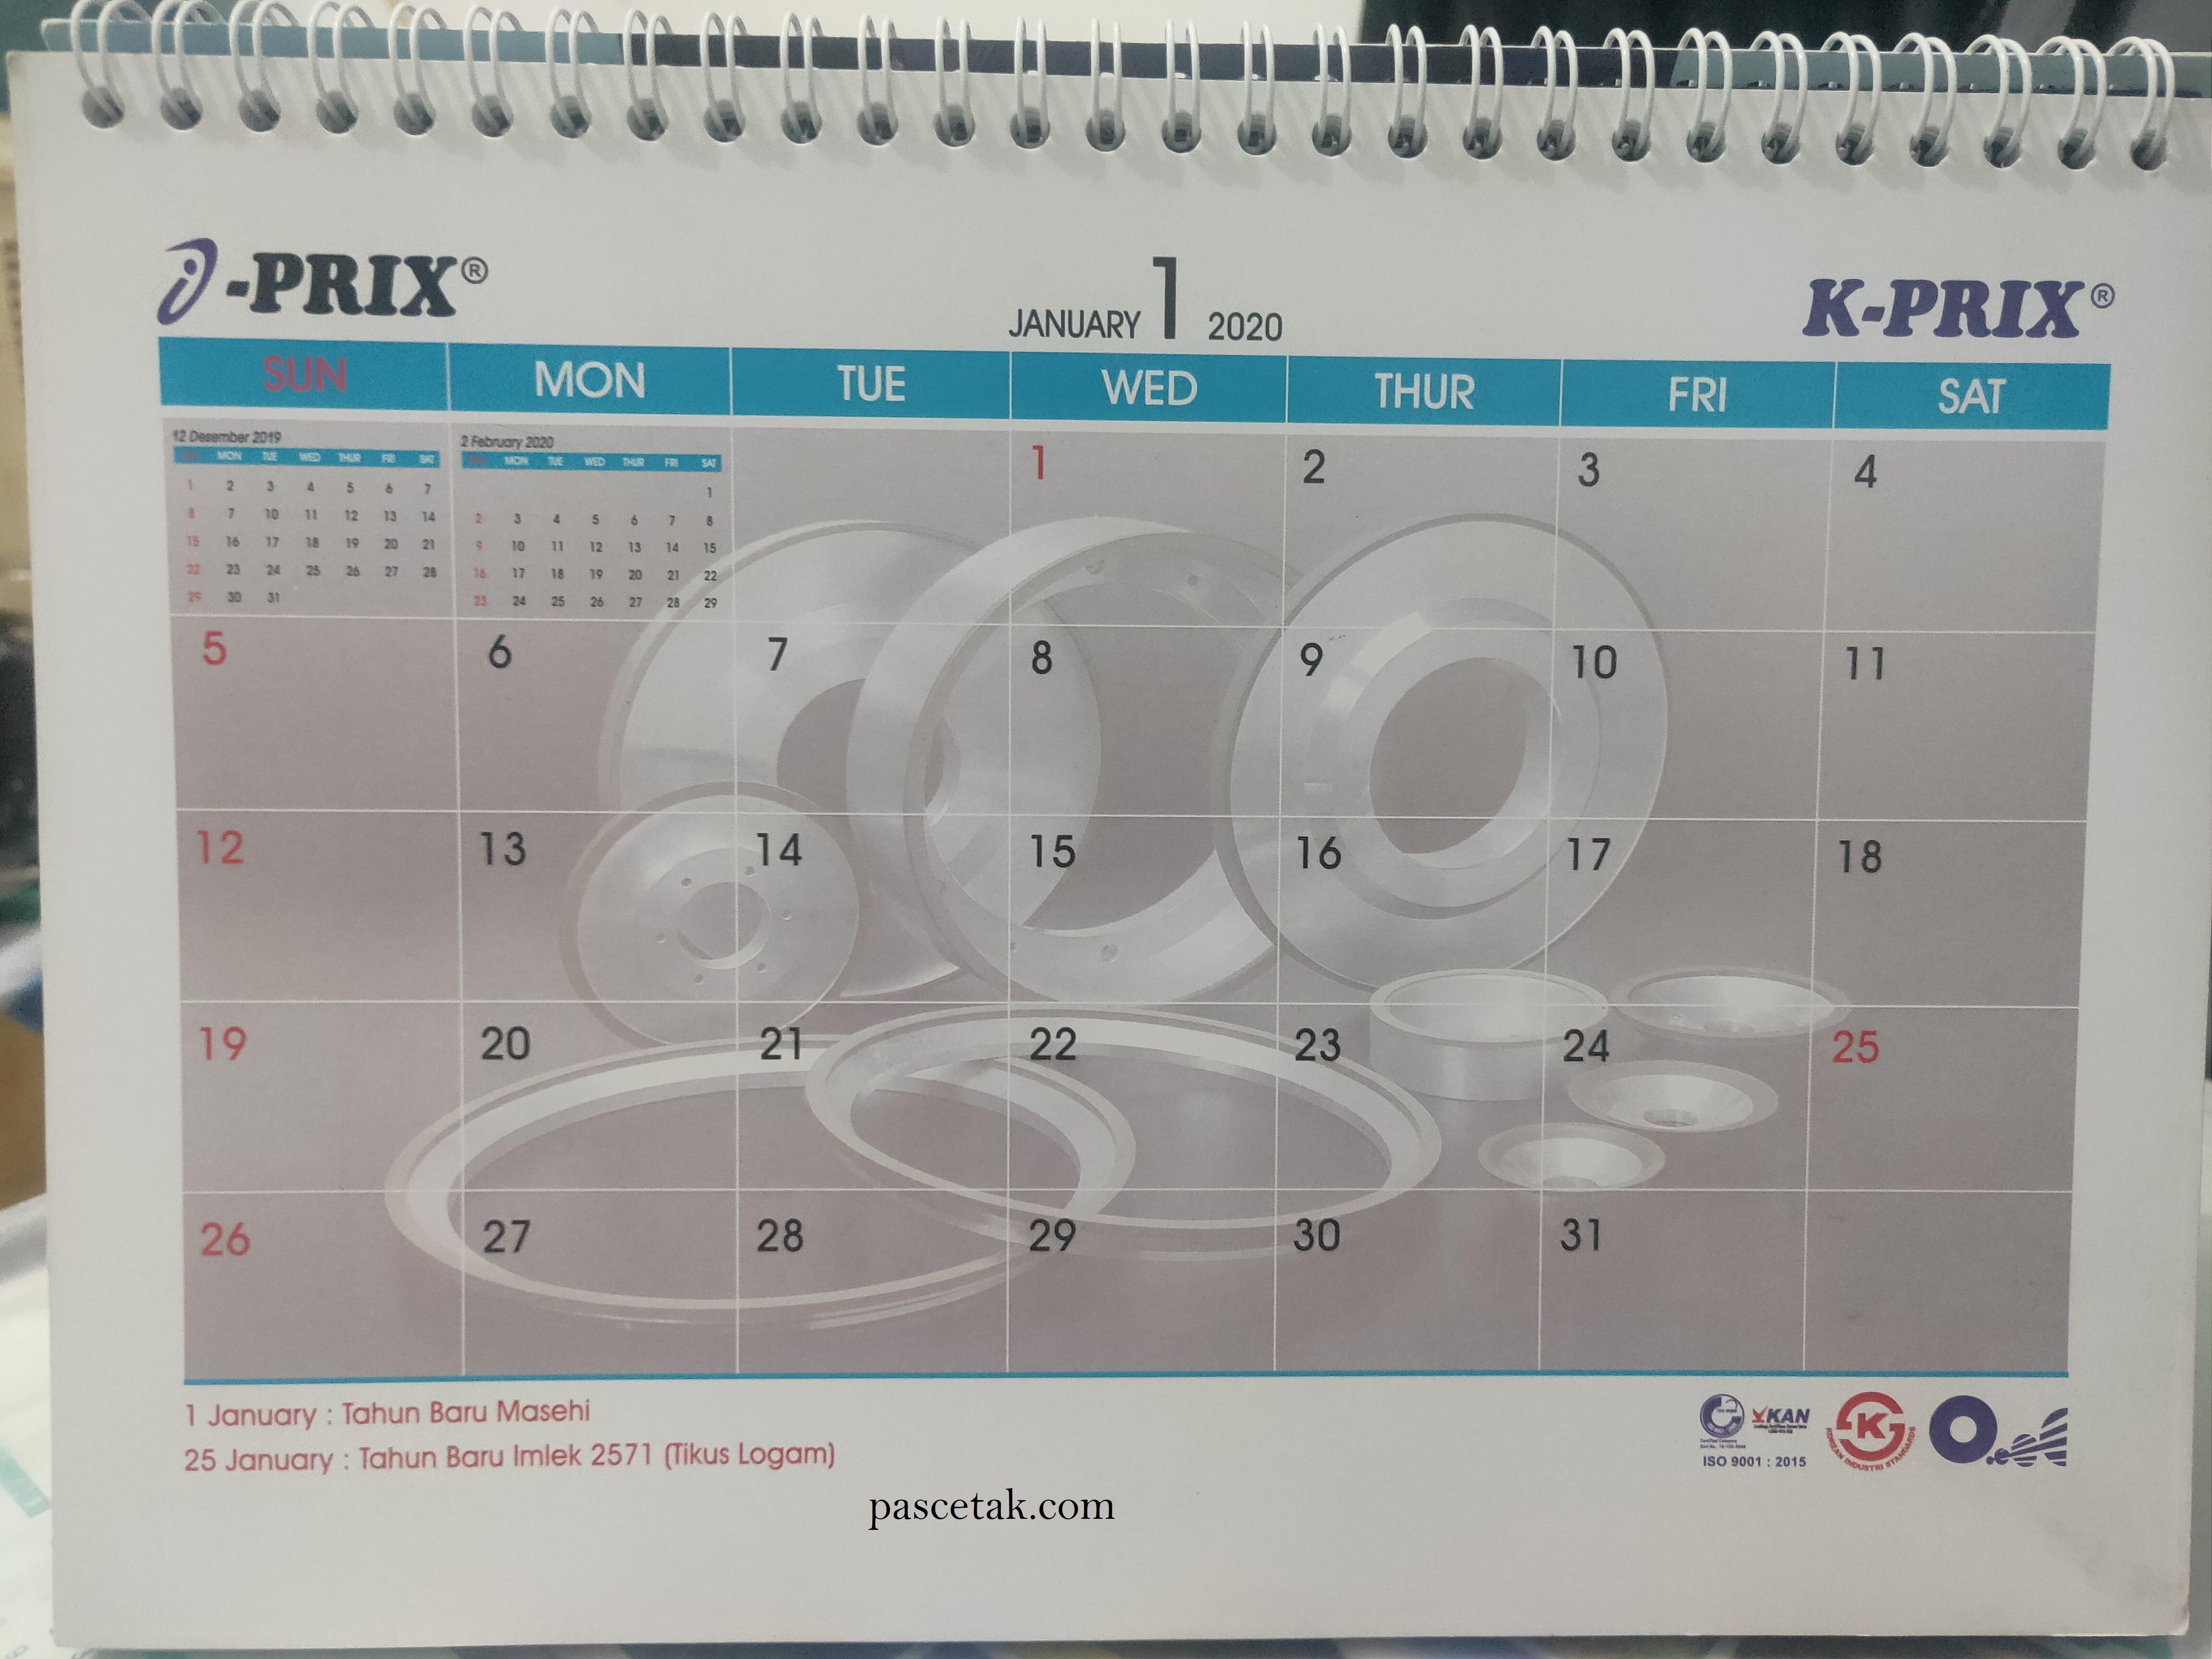 Jasa Cetak Kalender Murah Di Bekasi